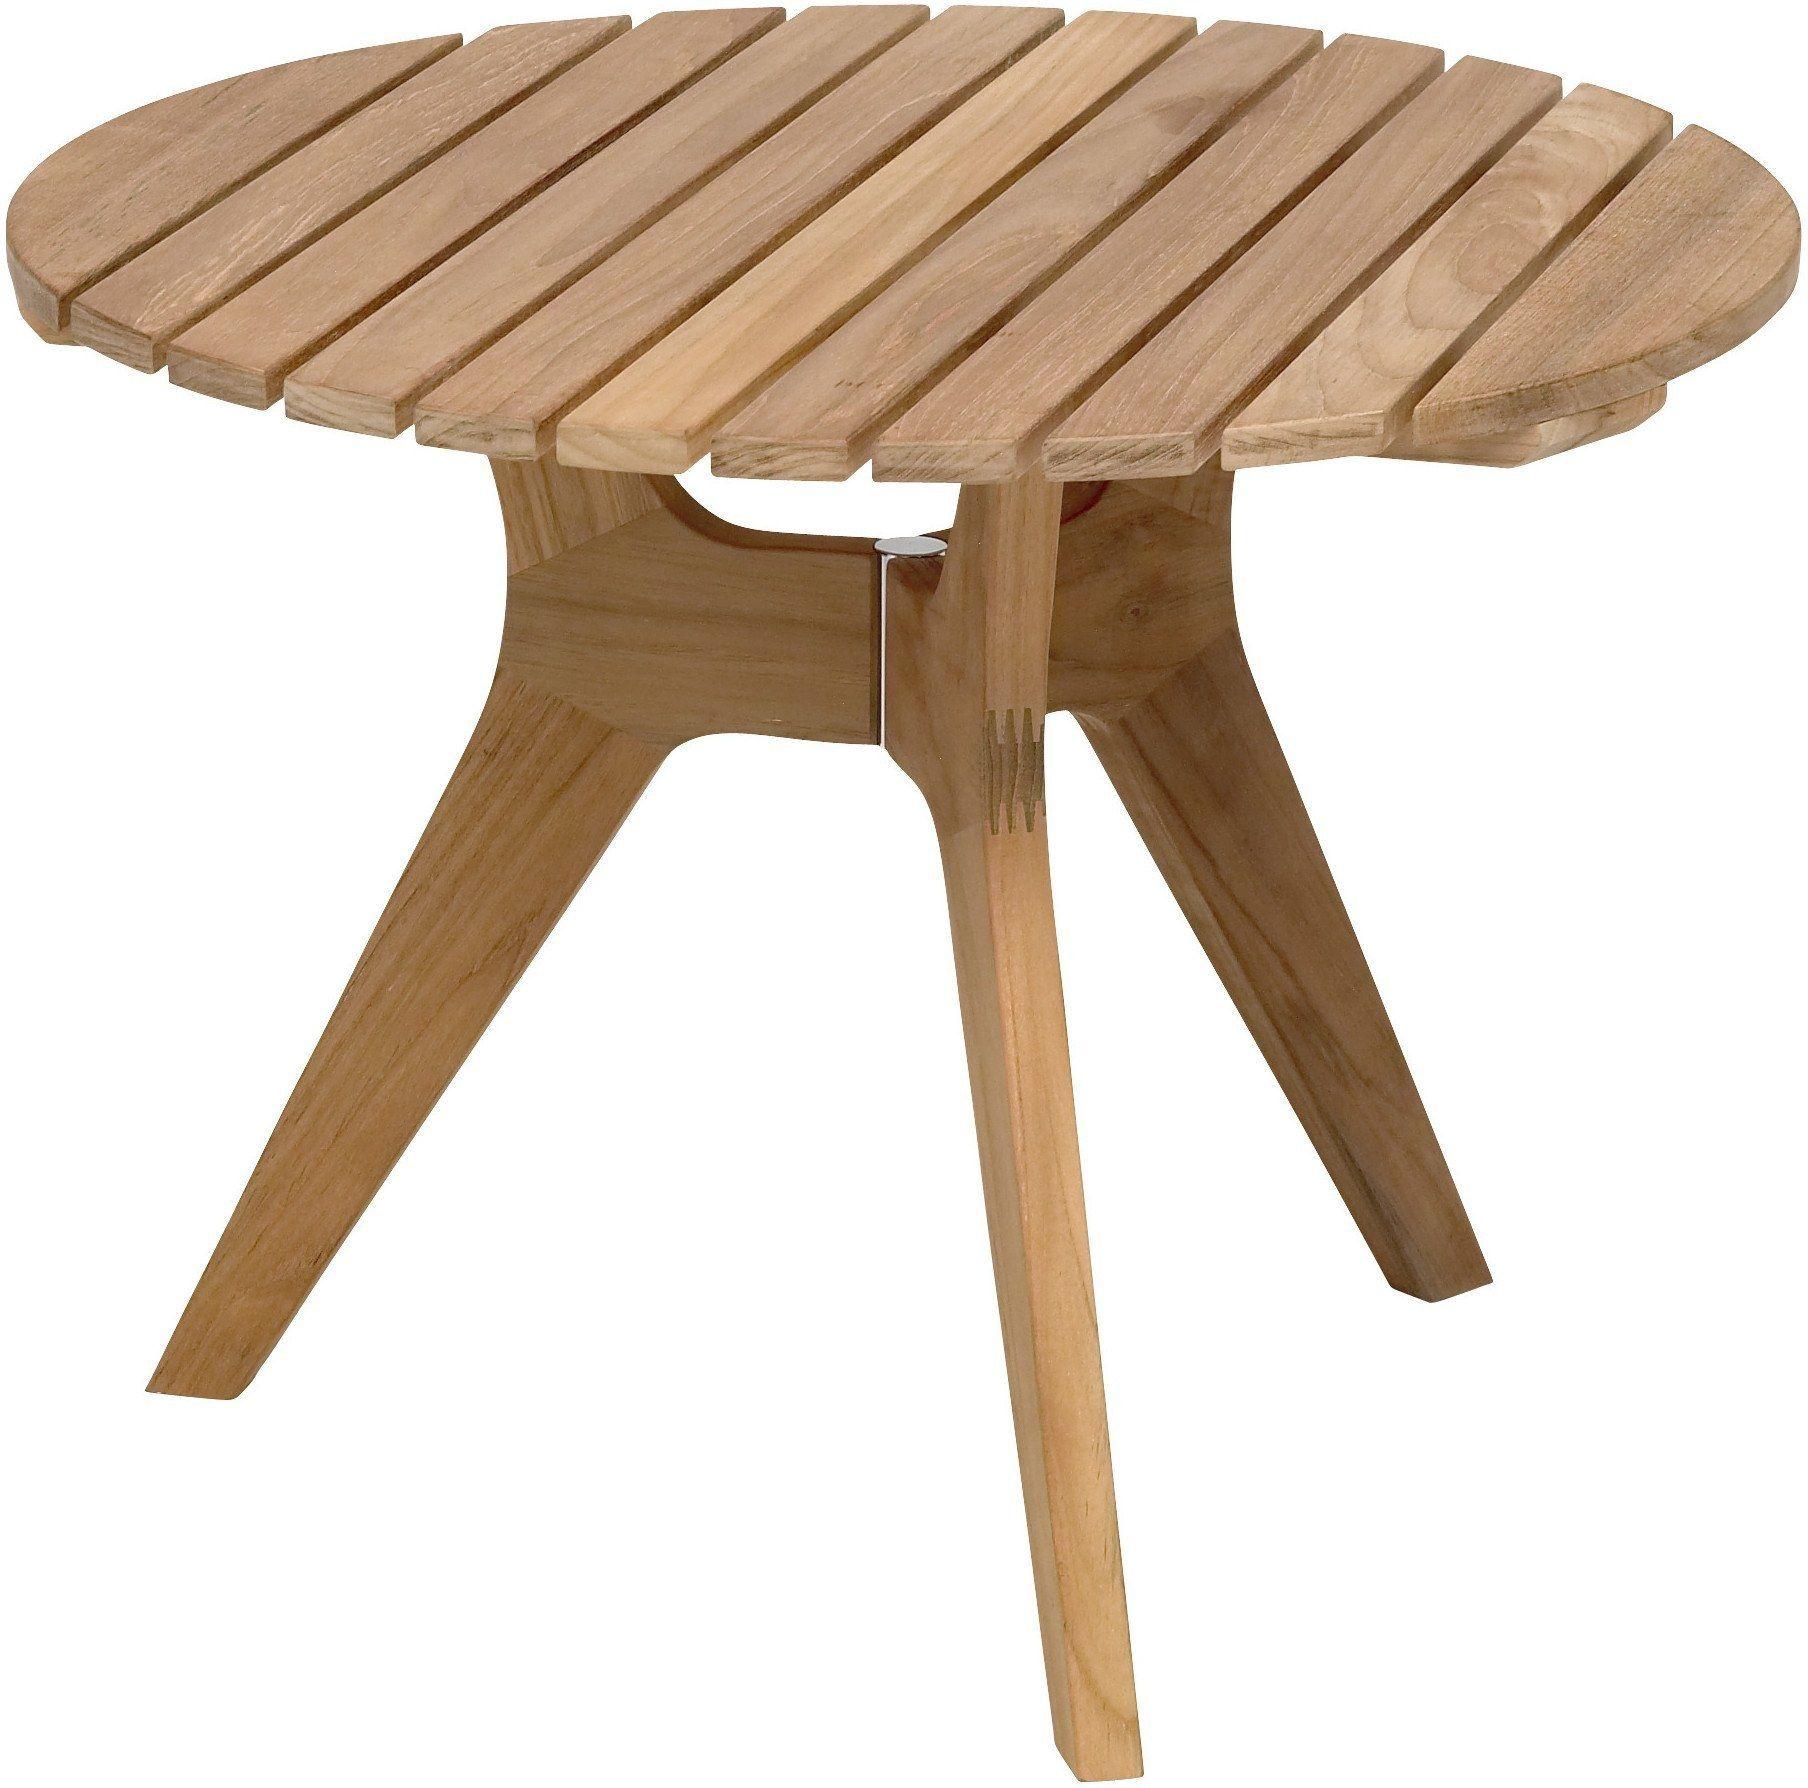 Stoly Ogrodowe Drewniane Goralskie Komplet Mebli Na Taras Parawan Ogrodowy Meble Tarasowe Metalowe Meble Og Outdoor Furniture Outdoor Ottoman Furniture